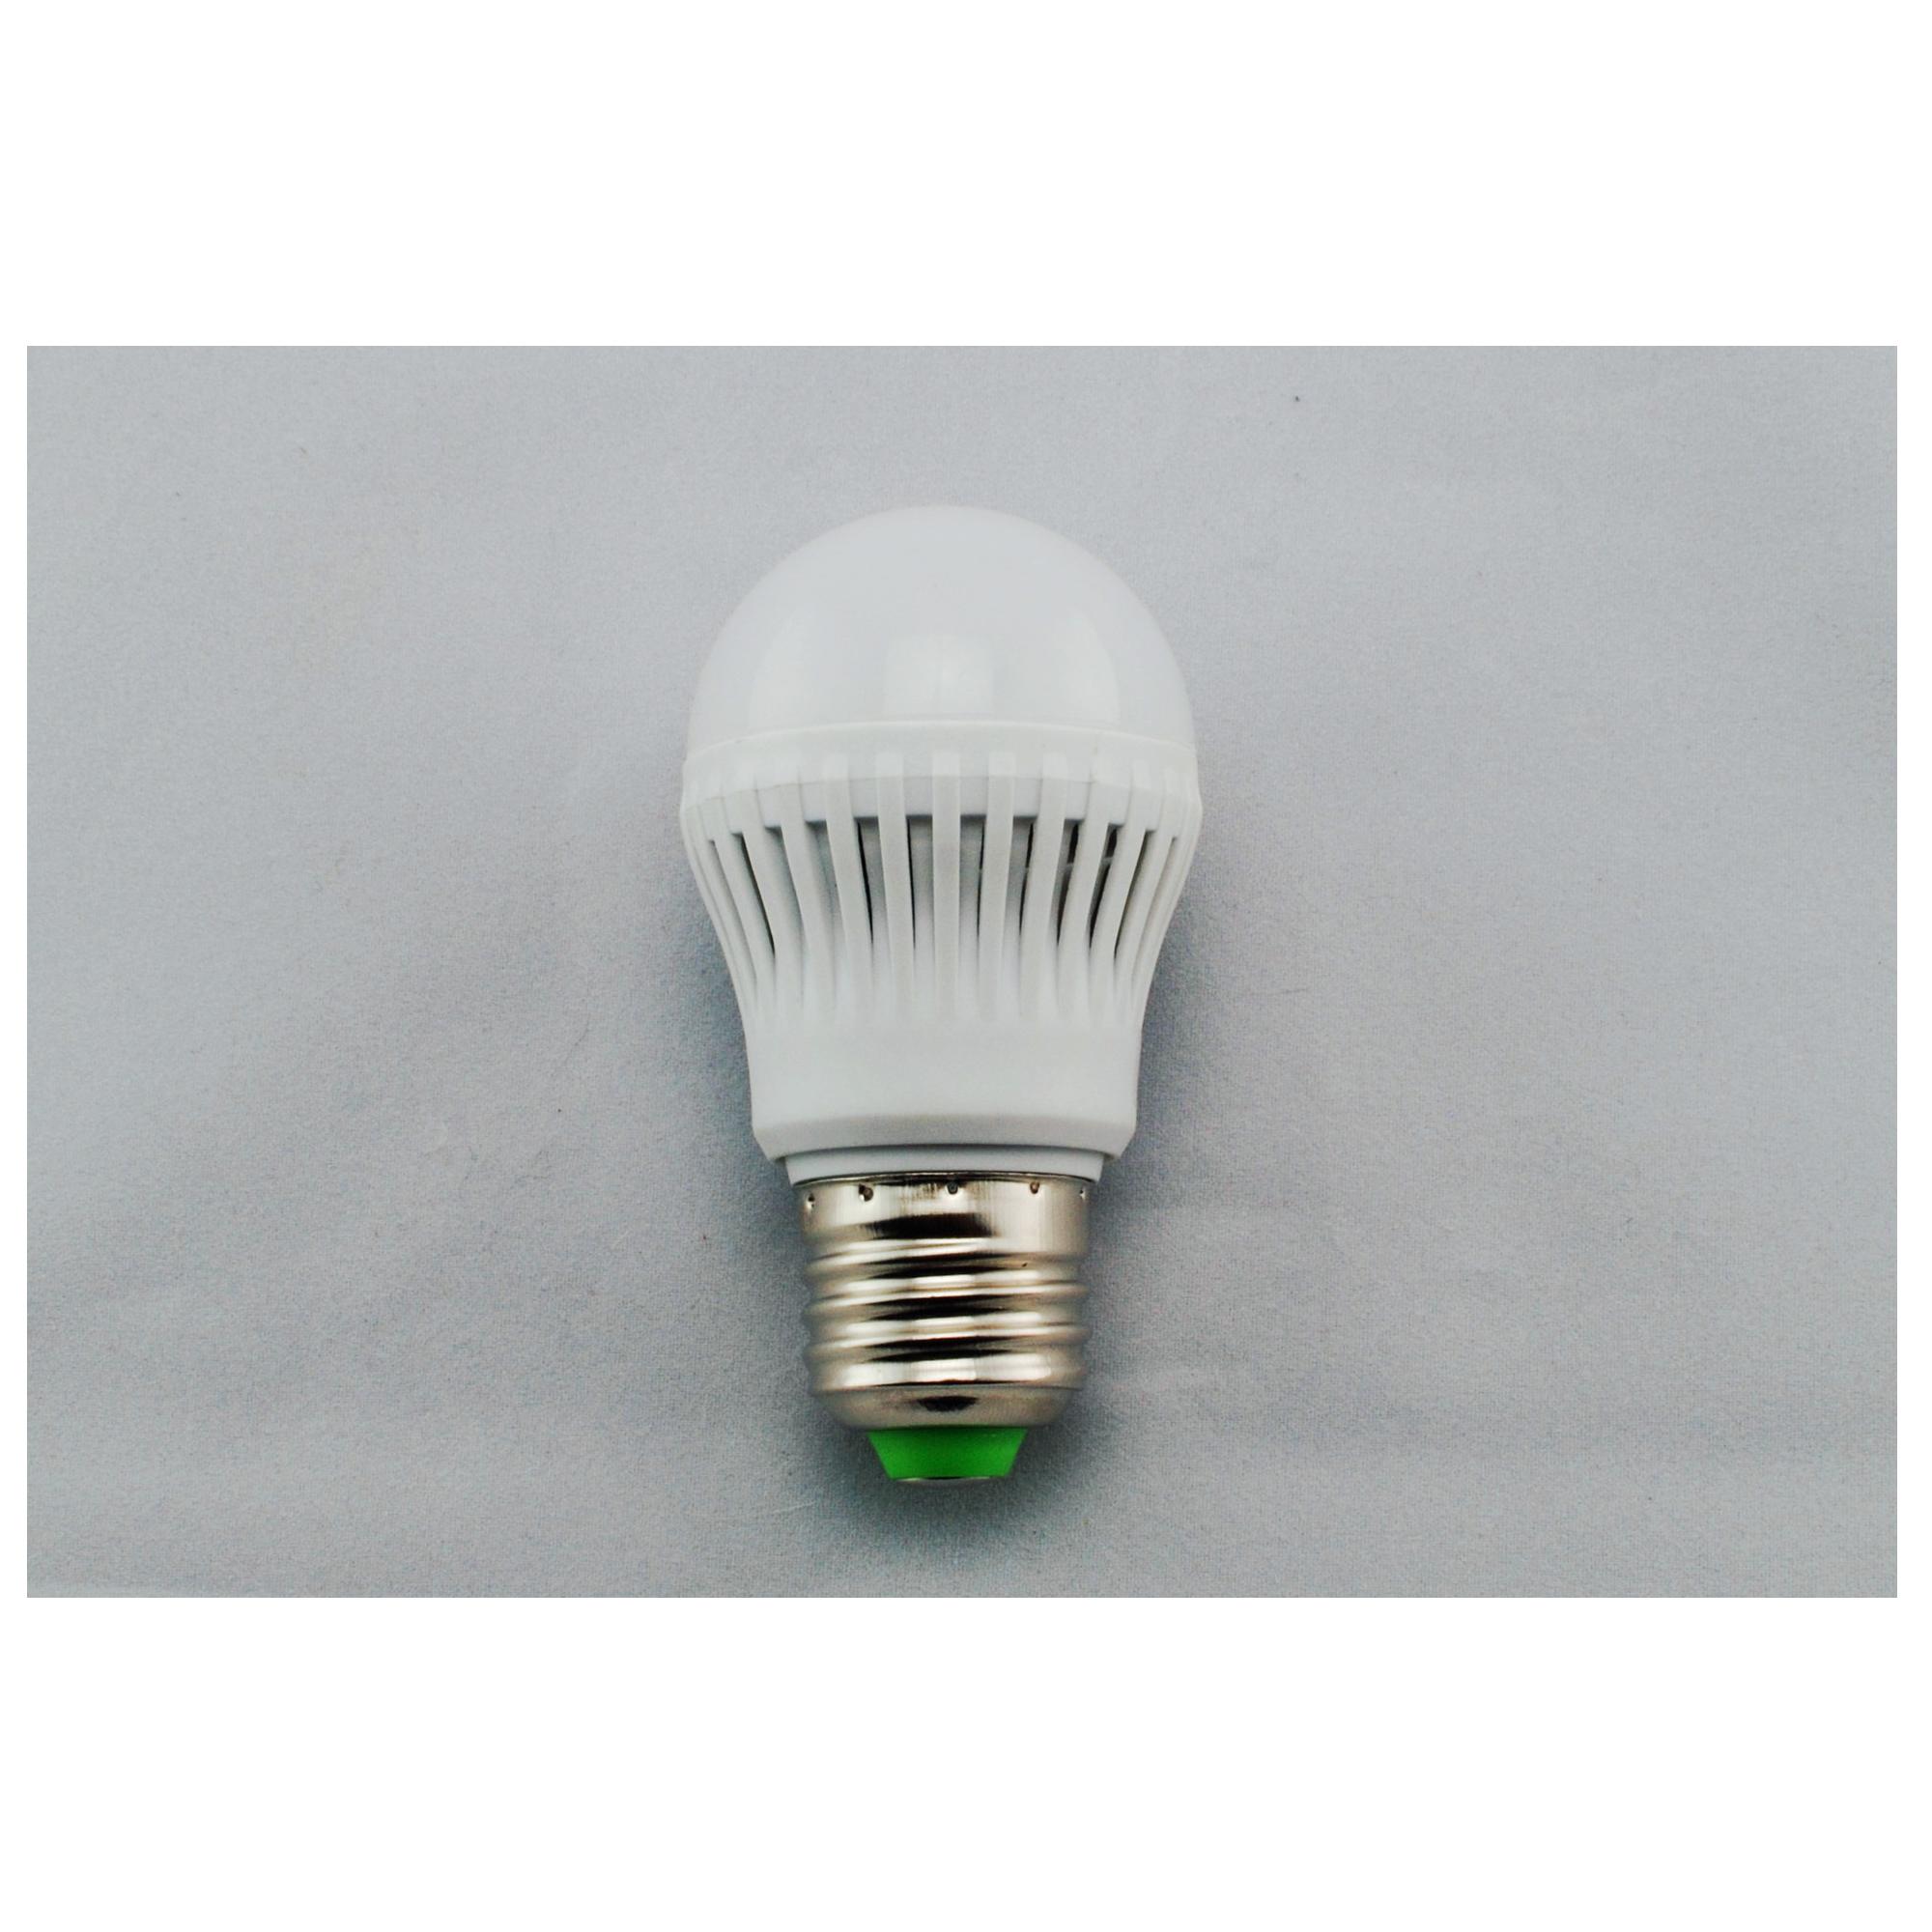 LED Bulb Light PMMA Cover+Plastic Radiator Epistar SMD 2835 E27 3W